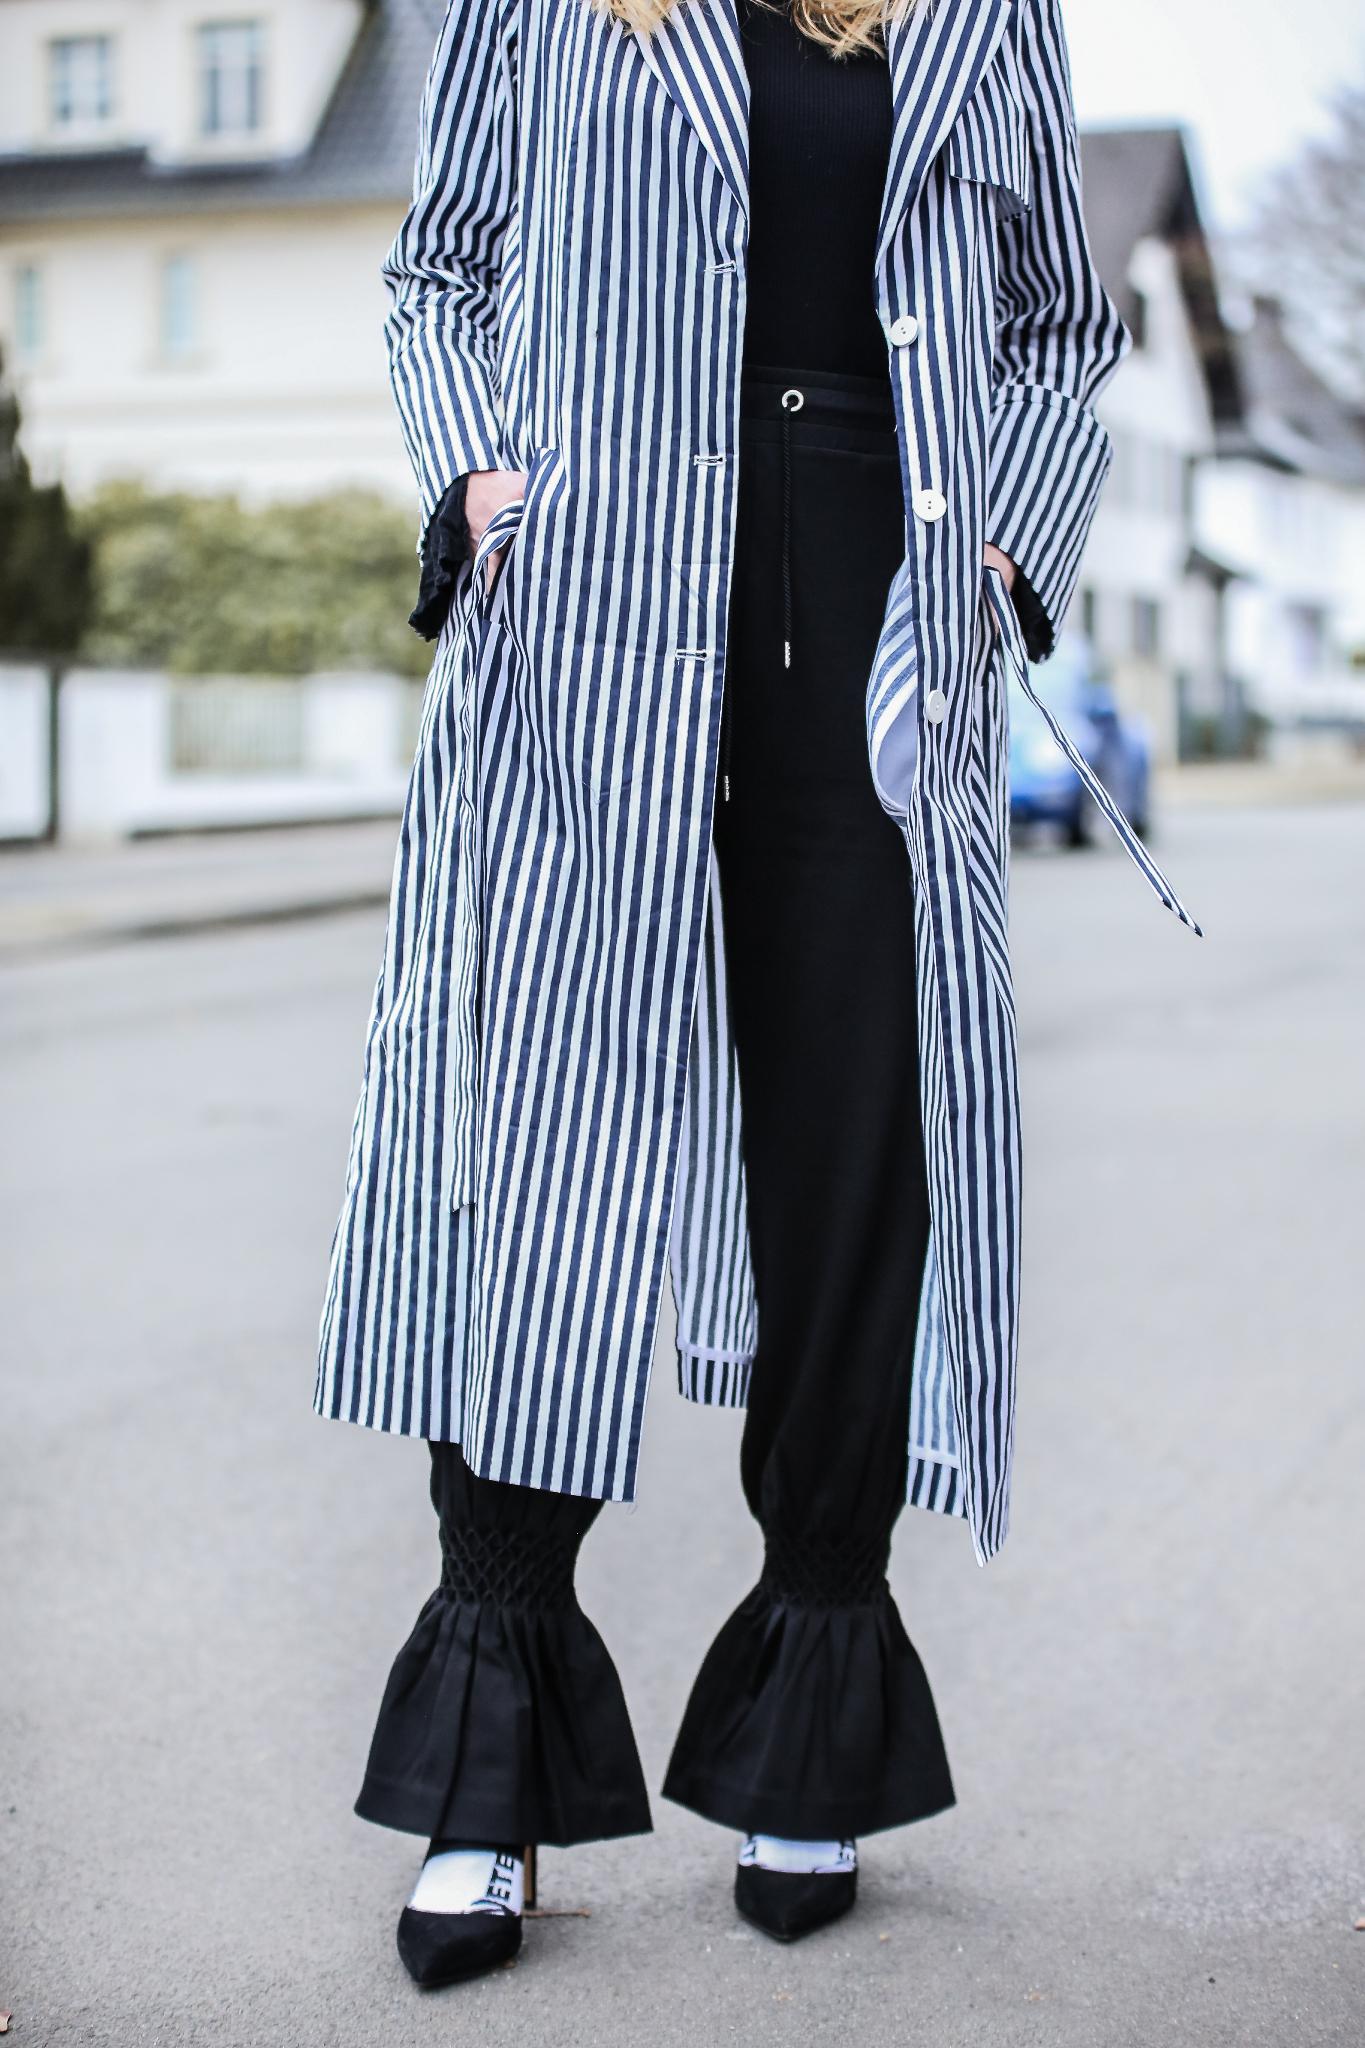 MOD-by-Monique-Fashion-Looks-Striped-Coat-Big-Volants-24